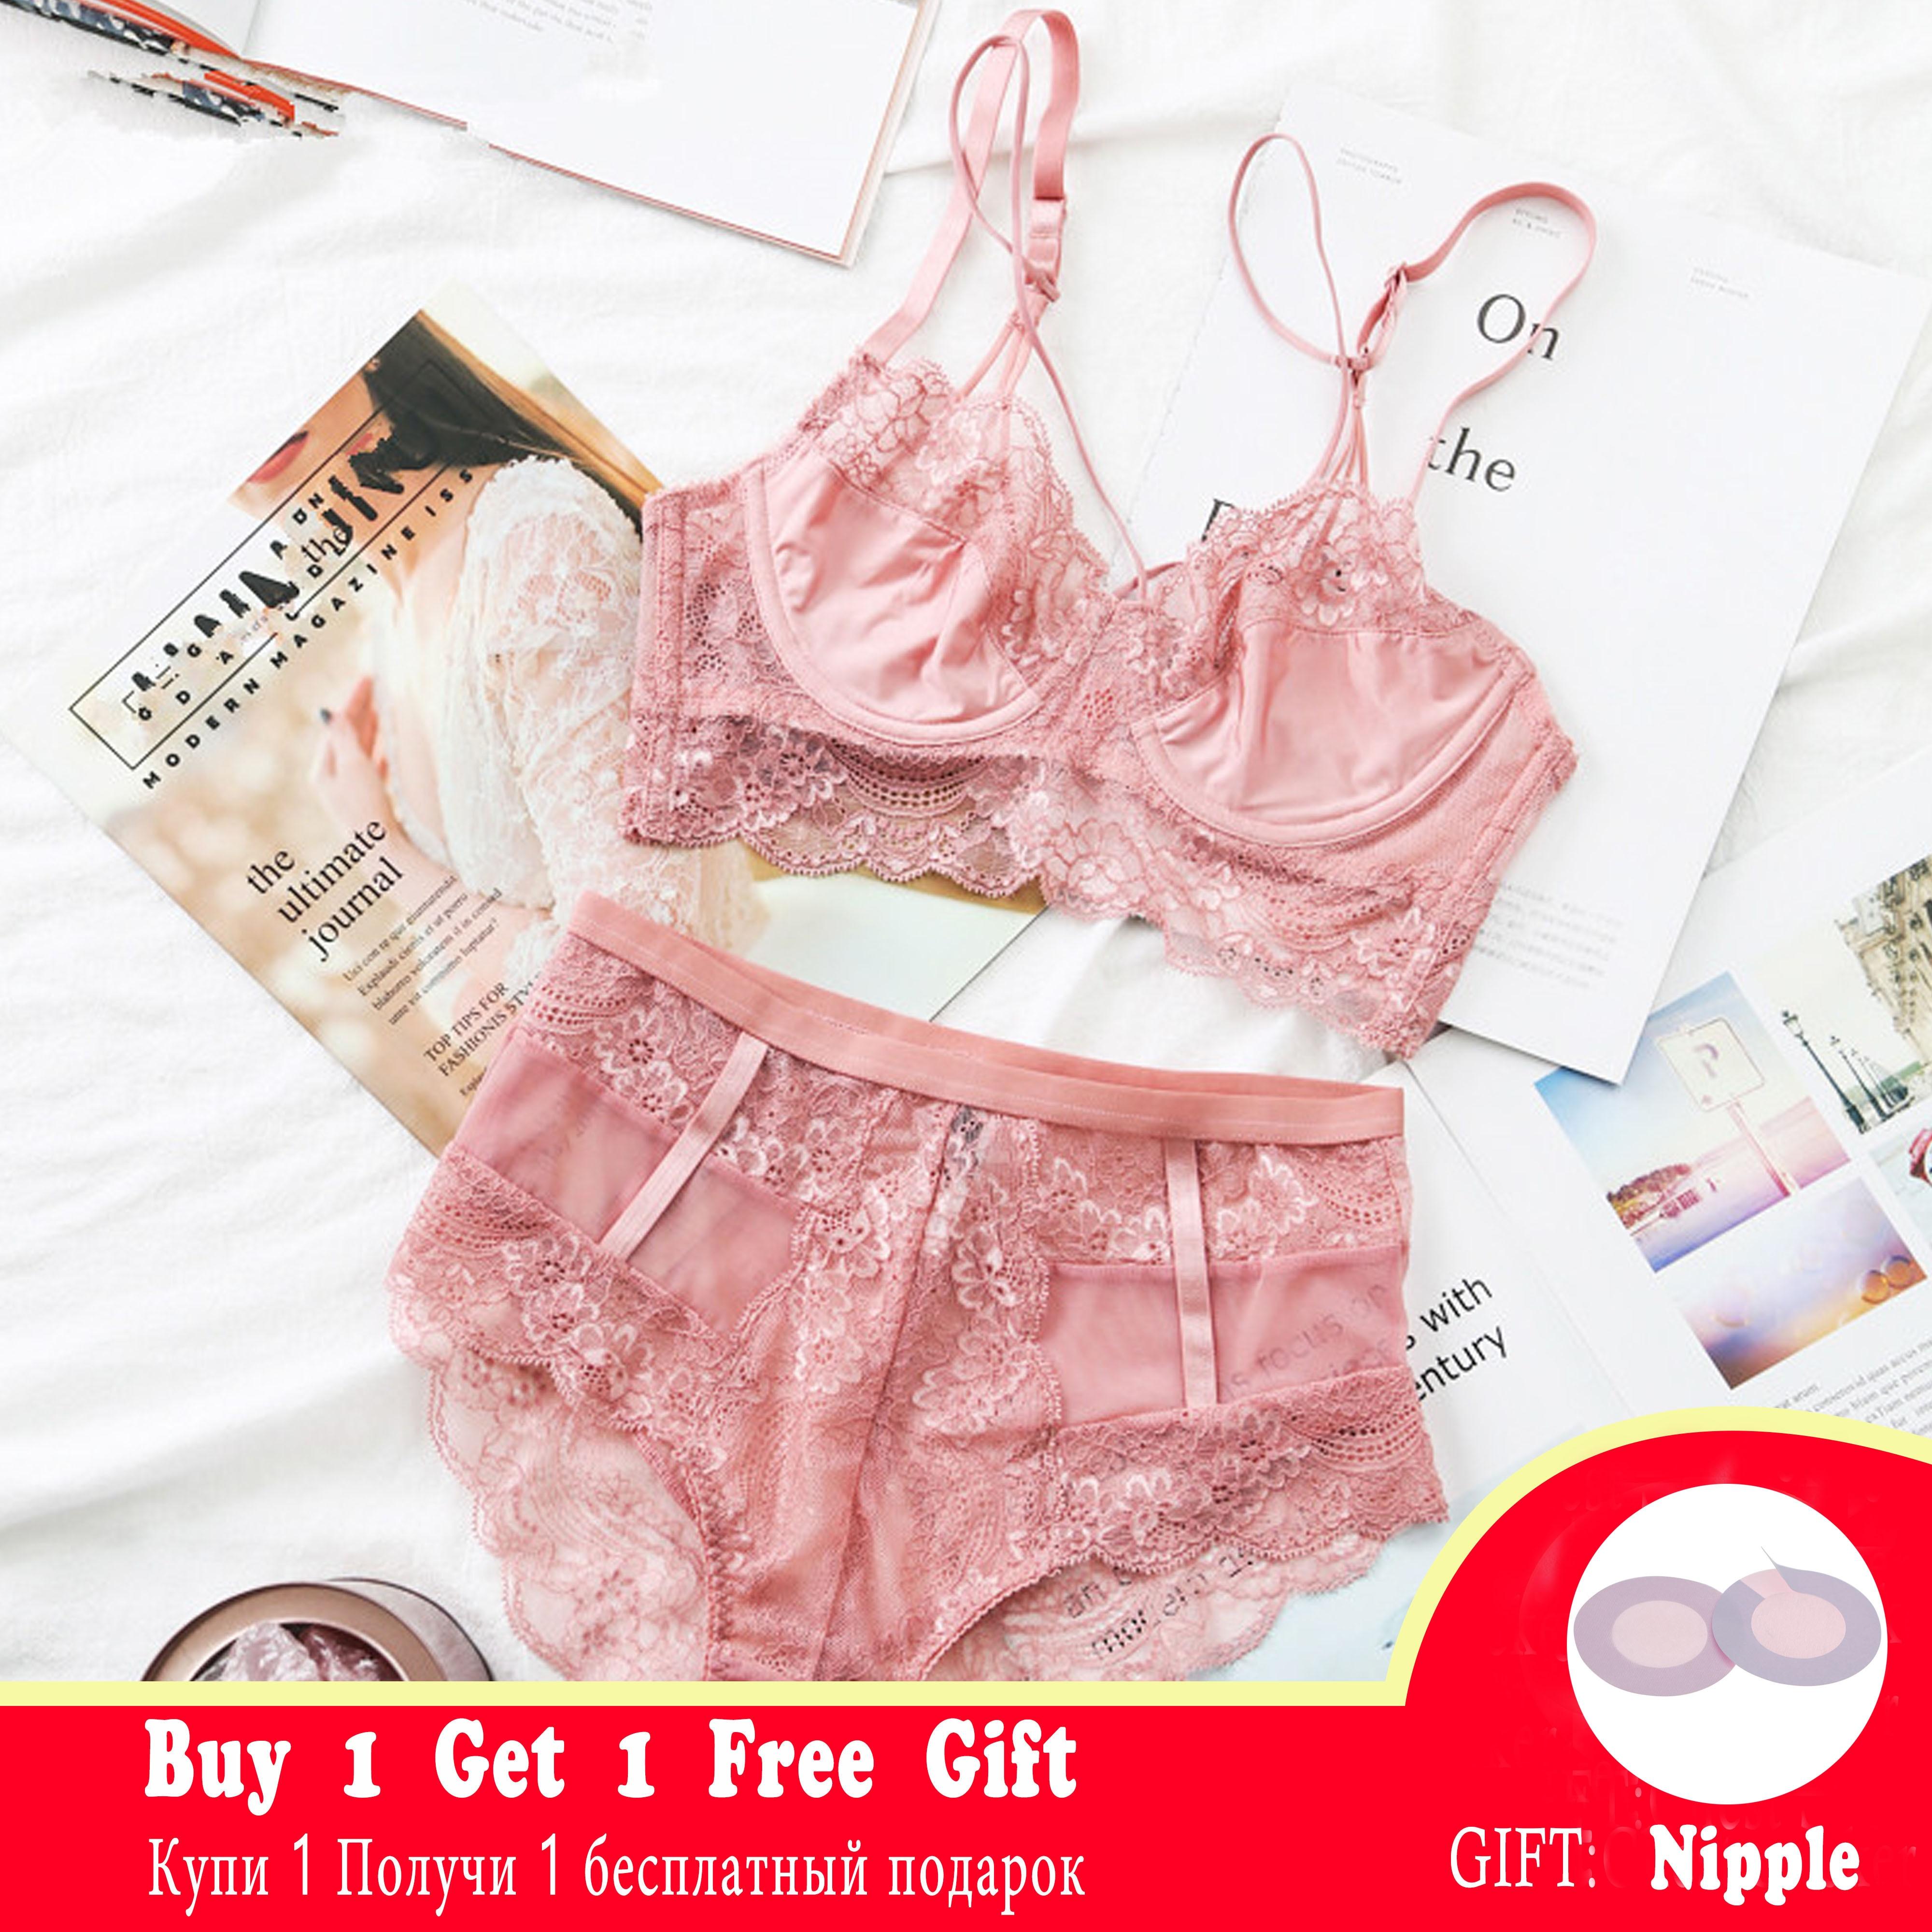 Classic Bandage Pink Bra Set Lingerie Push Up Brassiere Lace Underwear Set Sexy High-Waist Panties For Women underwear